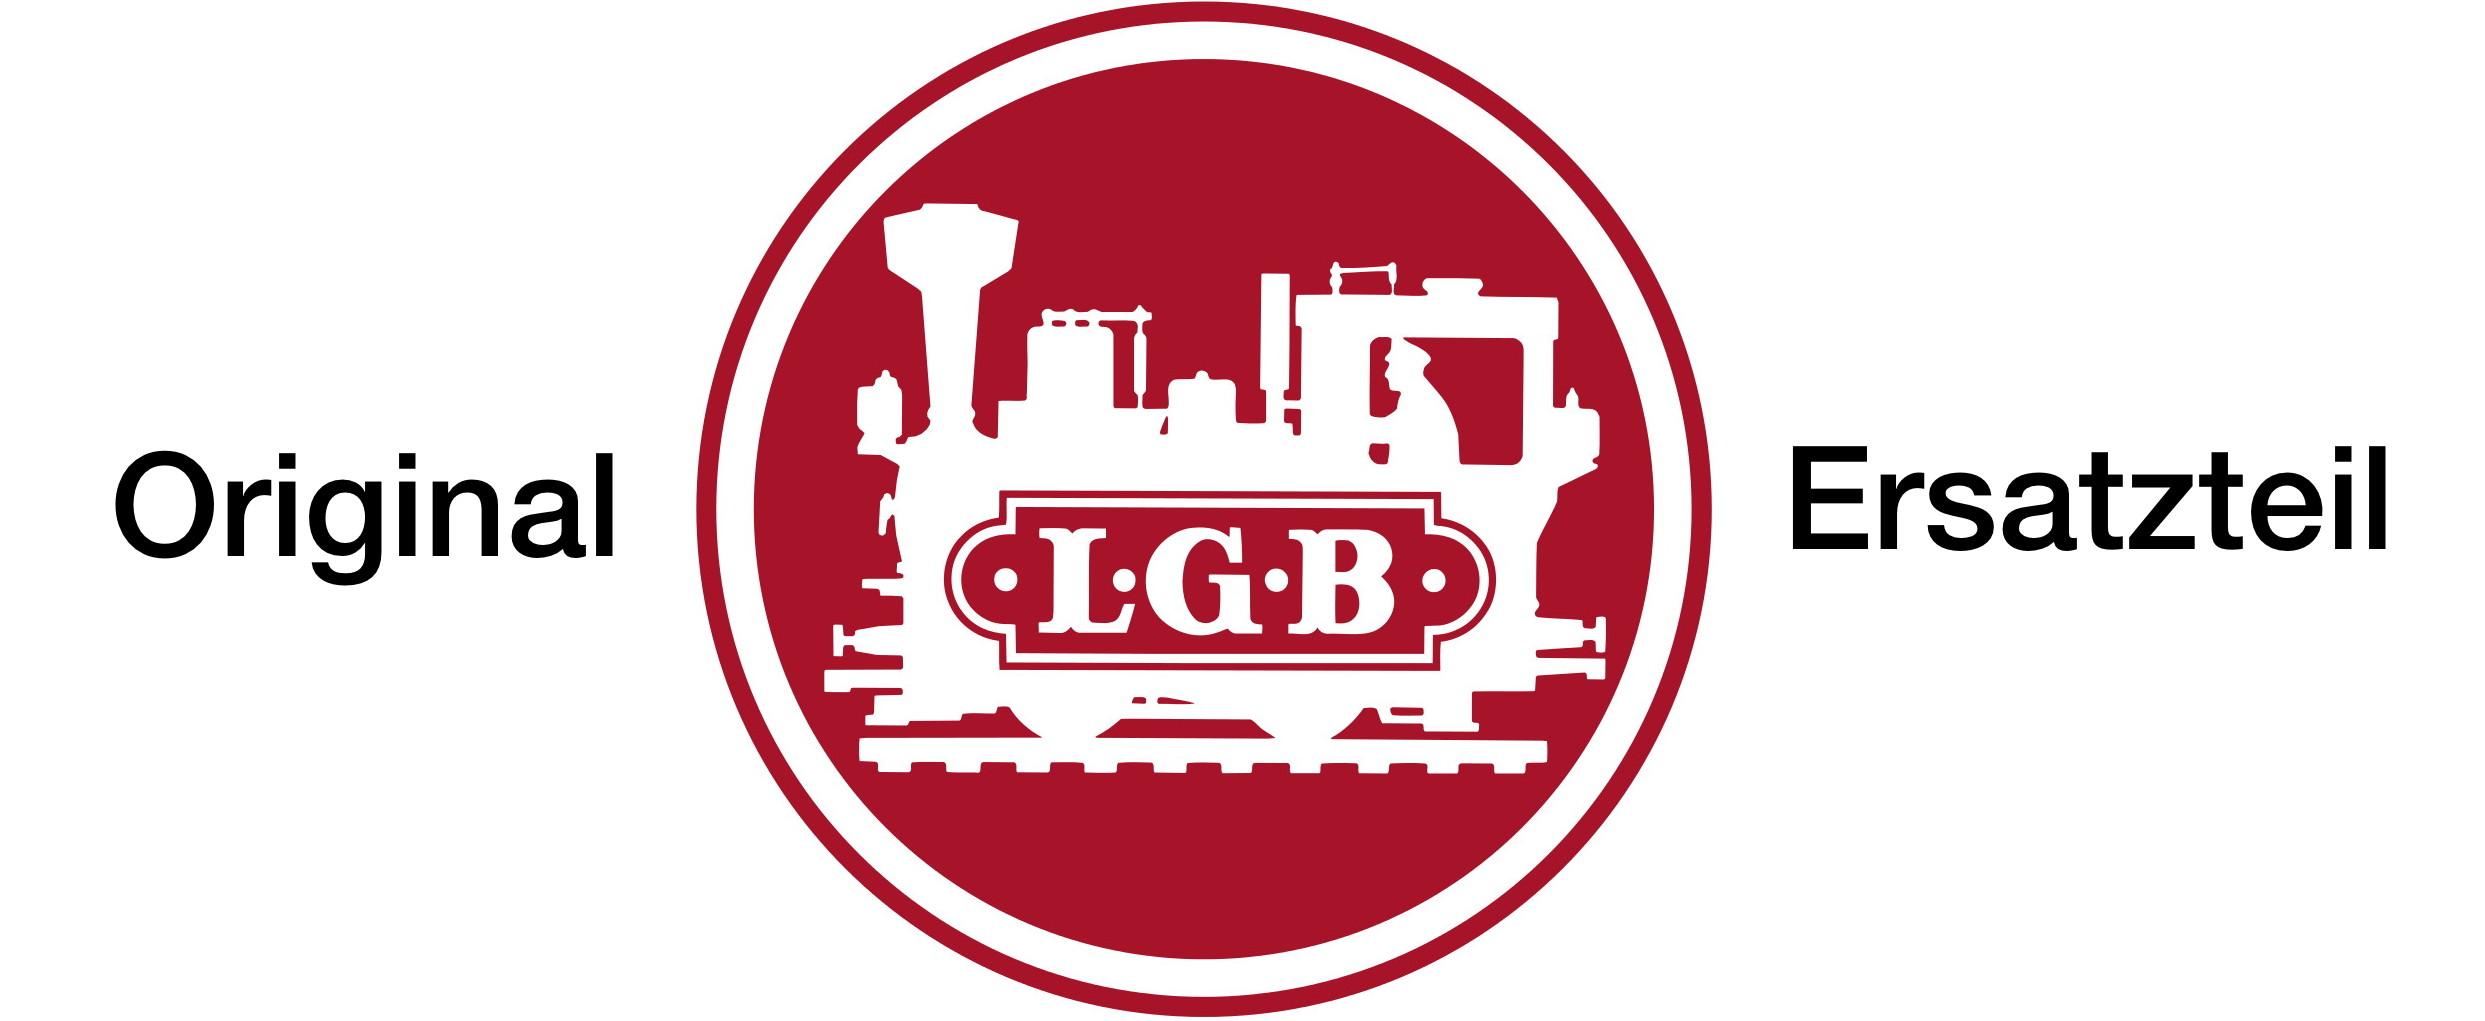 Original LGB Ersatzteile